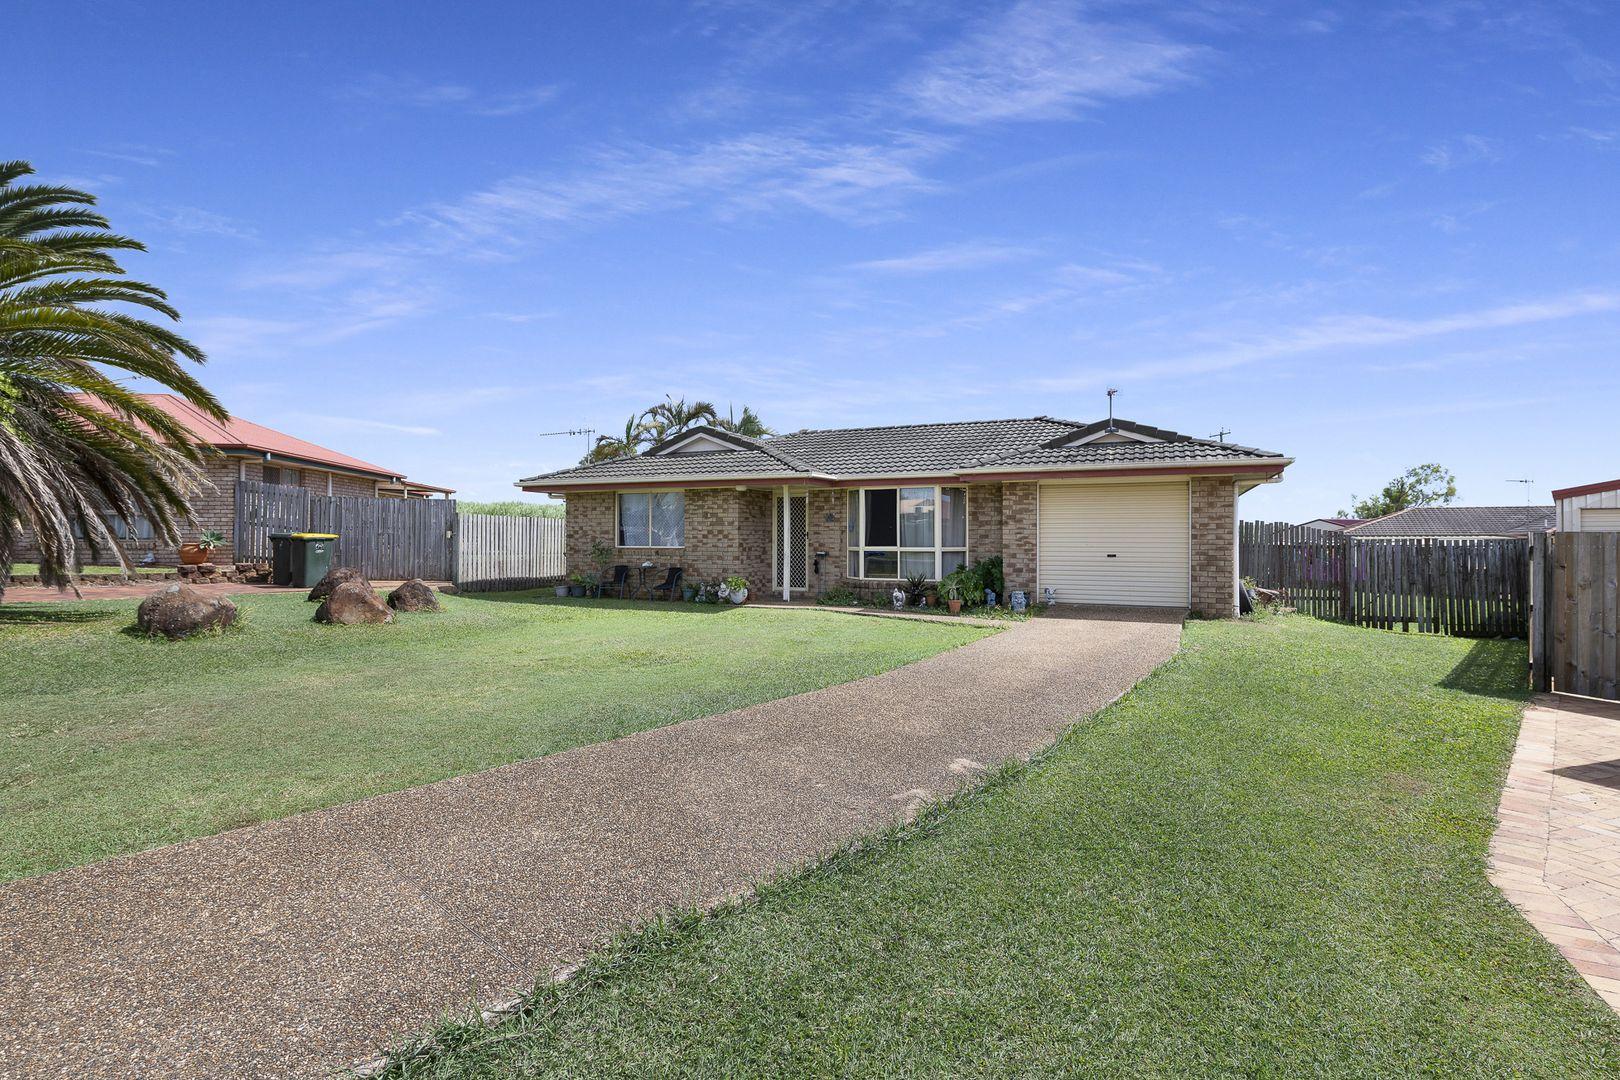 8 Metcalfe Court, Kalkie QLD 4670, Image 1